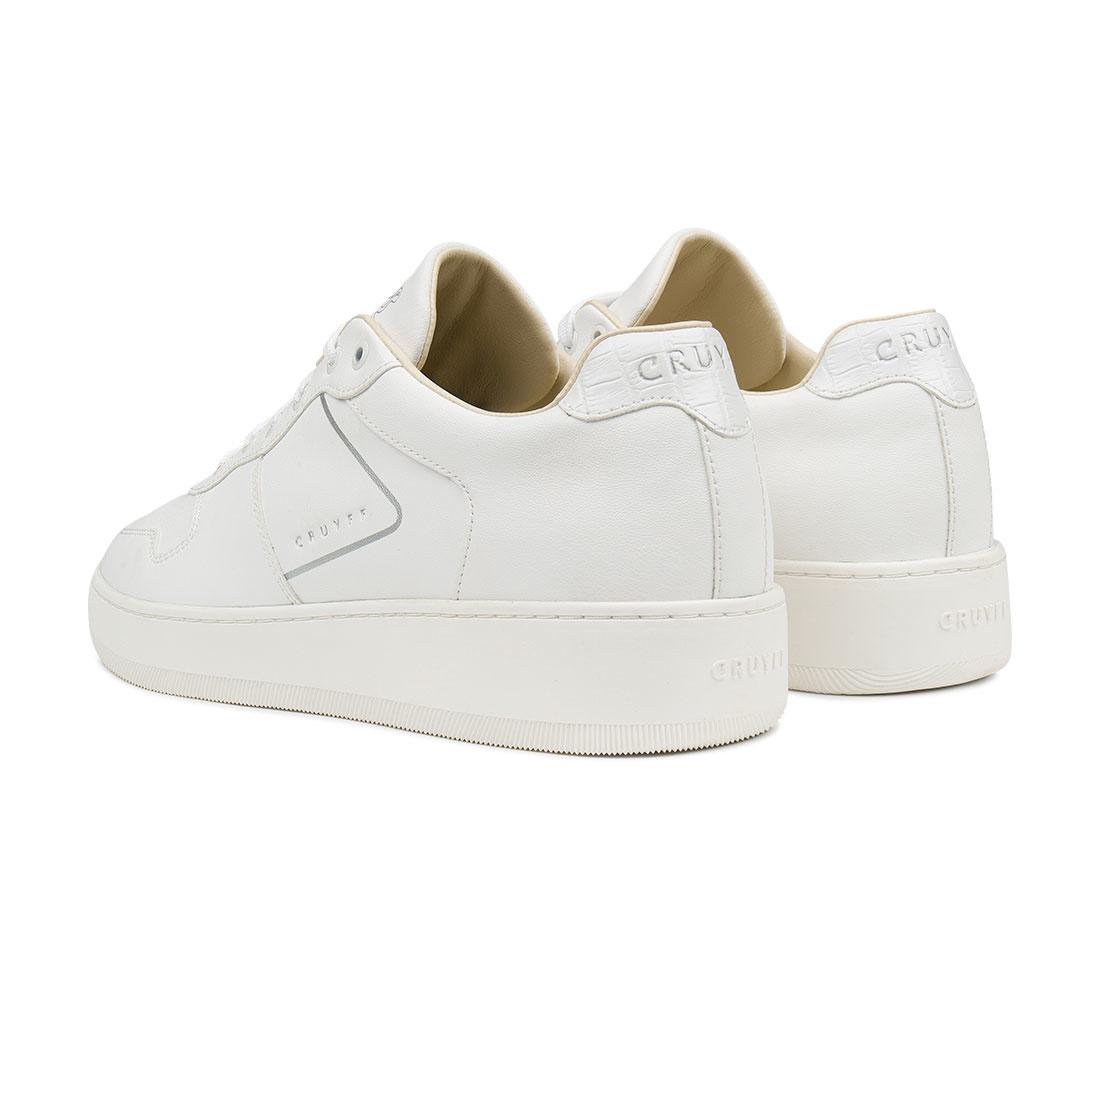 Cruyff Royal White-4